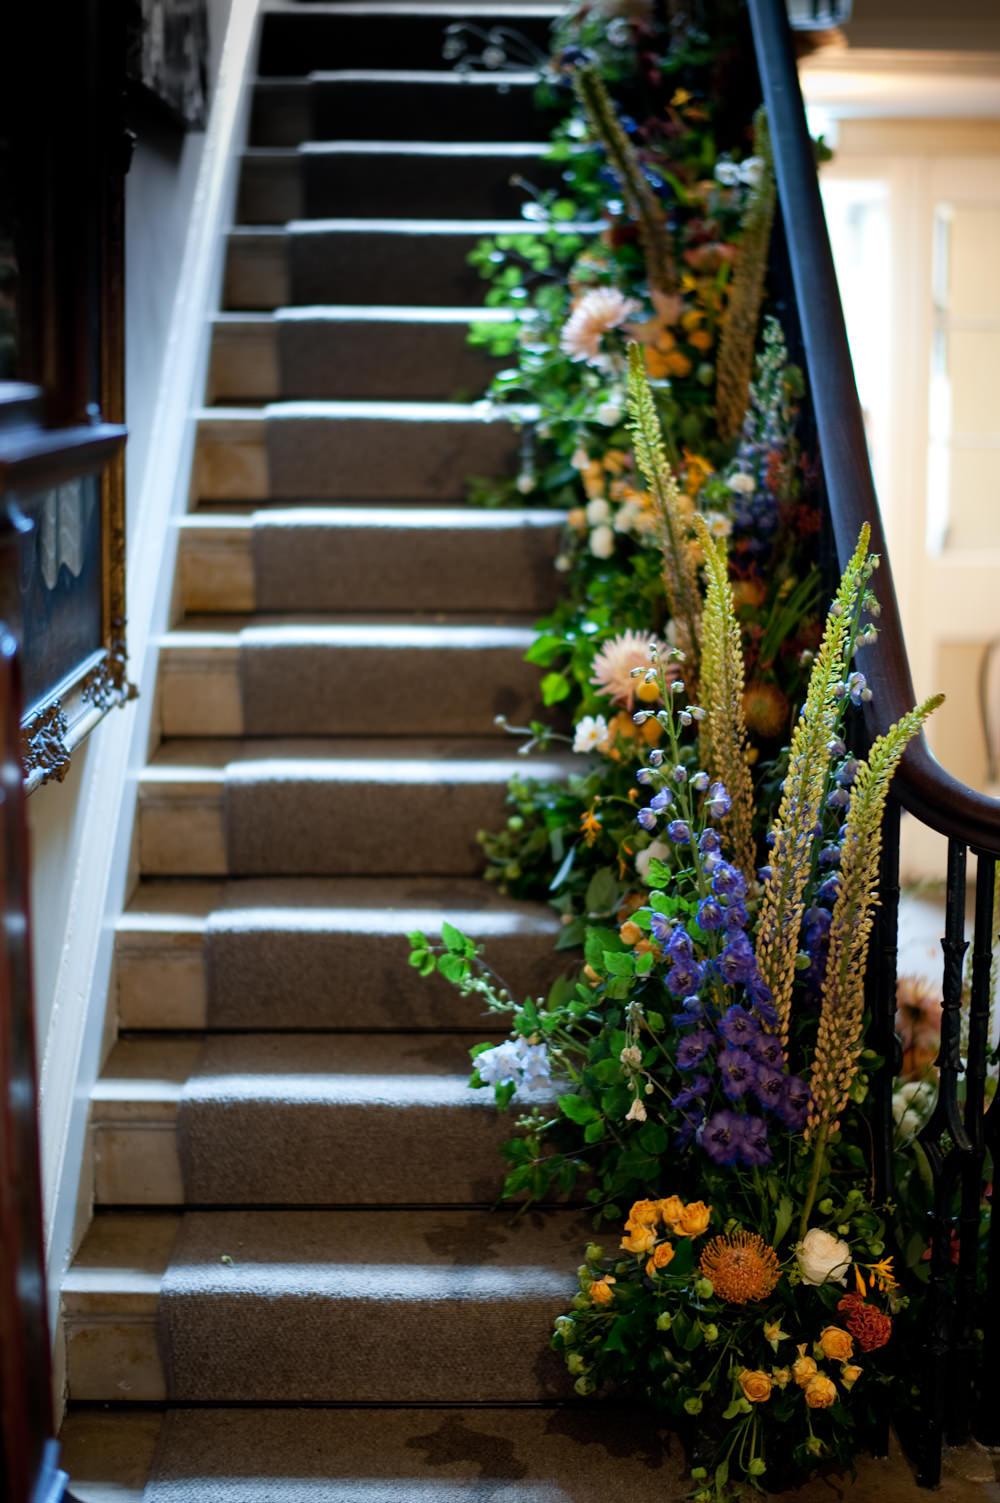 Meadow Flowers Stairs Arrangement Floral Wedding Rachael Connerton Photography